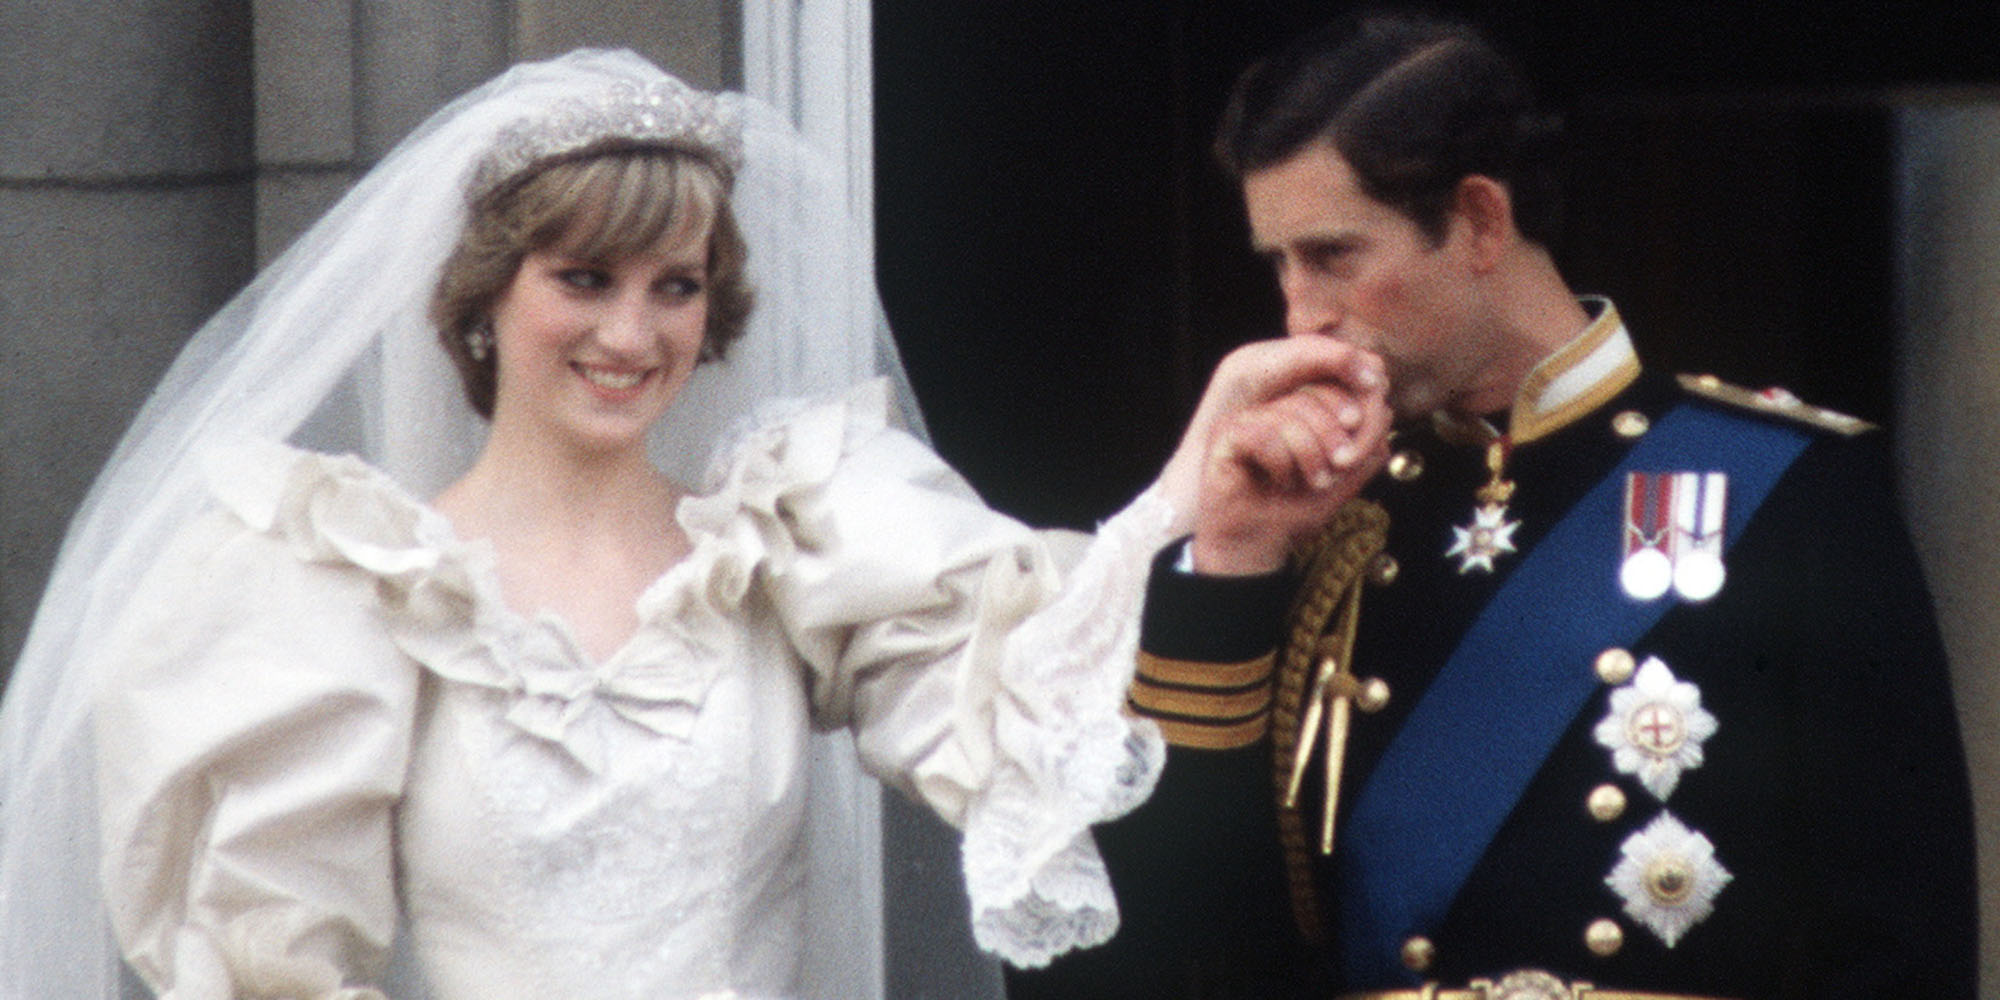 Beauty Fashion 1501 Videos: Princess Diana's Wedding Photo Retrospective